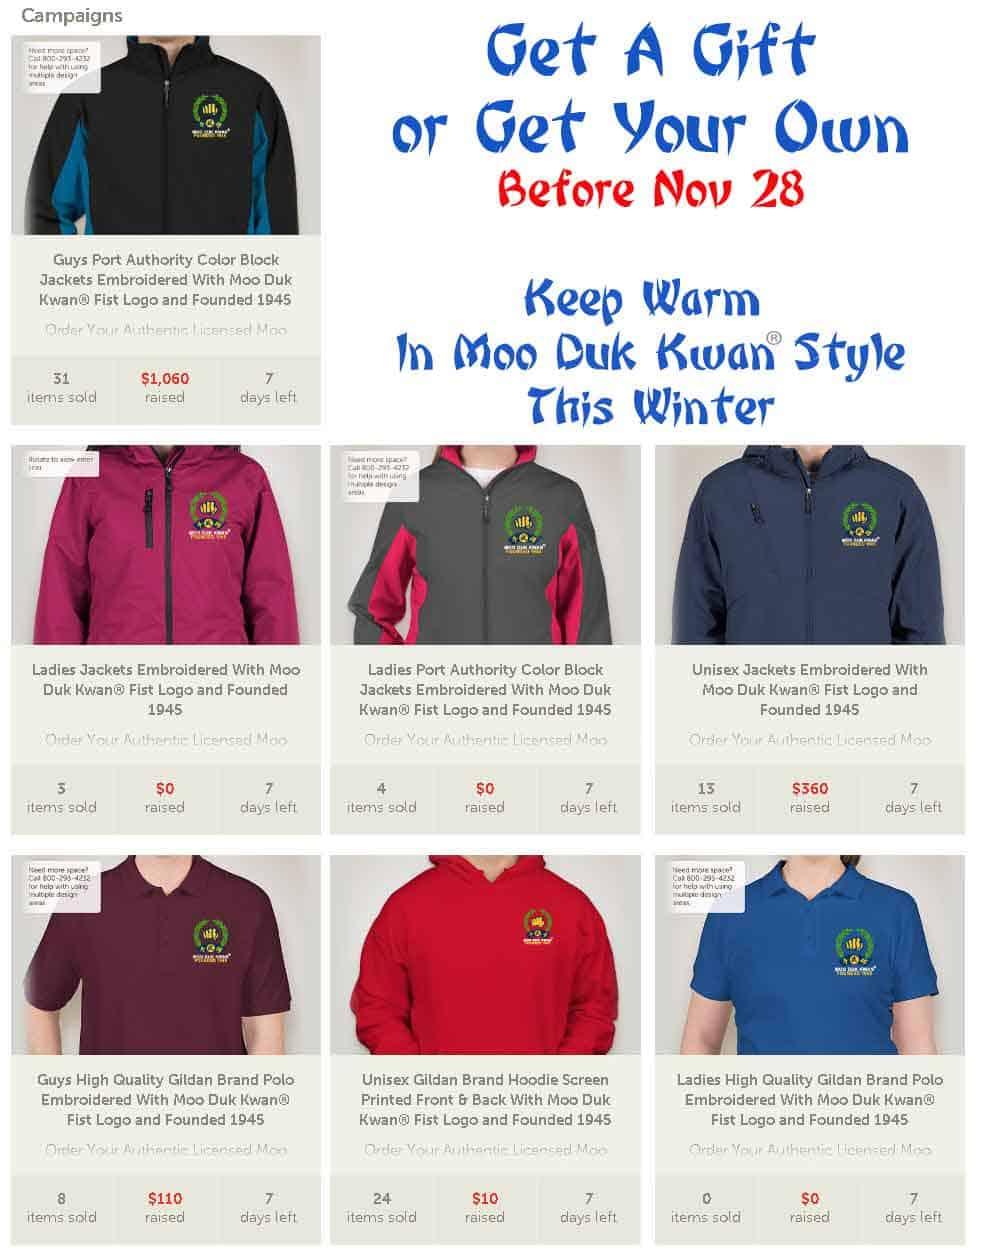 Order online before November 28